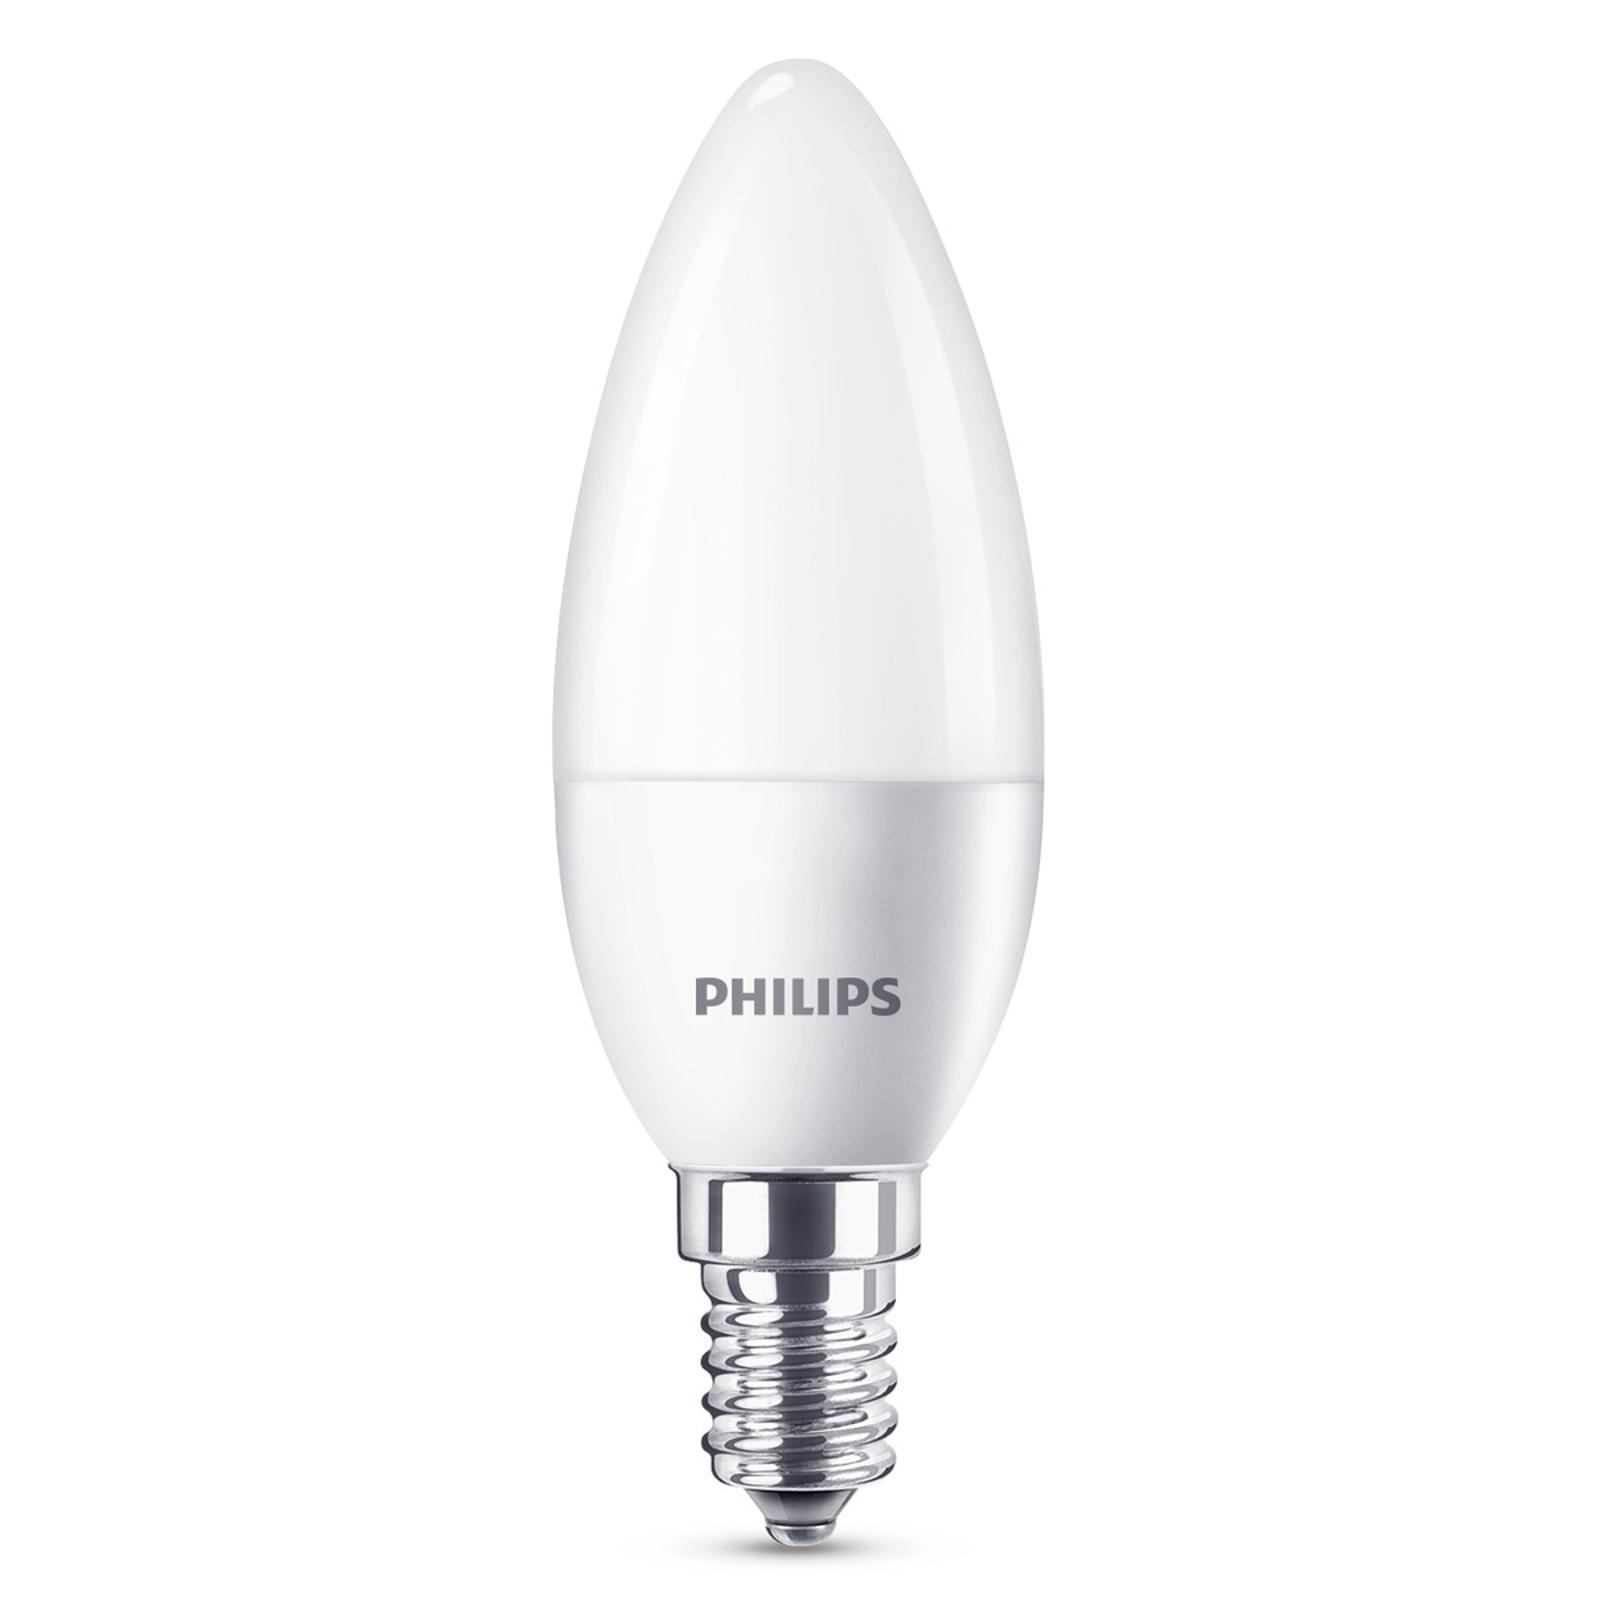 Philips E14 4,3W 840 LED-Kerzenlampe matt